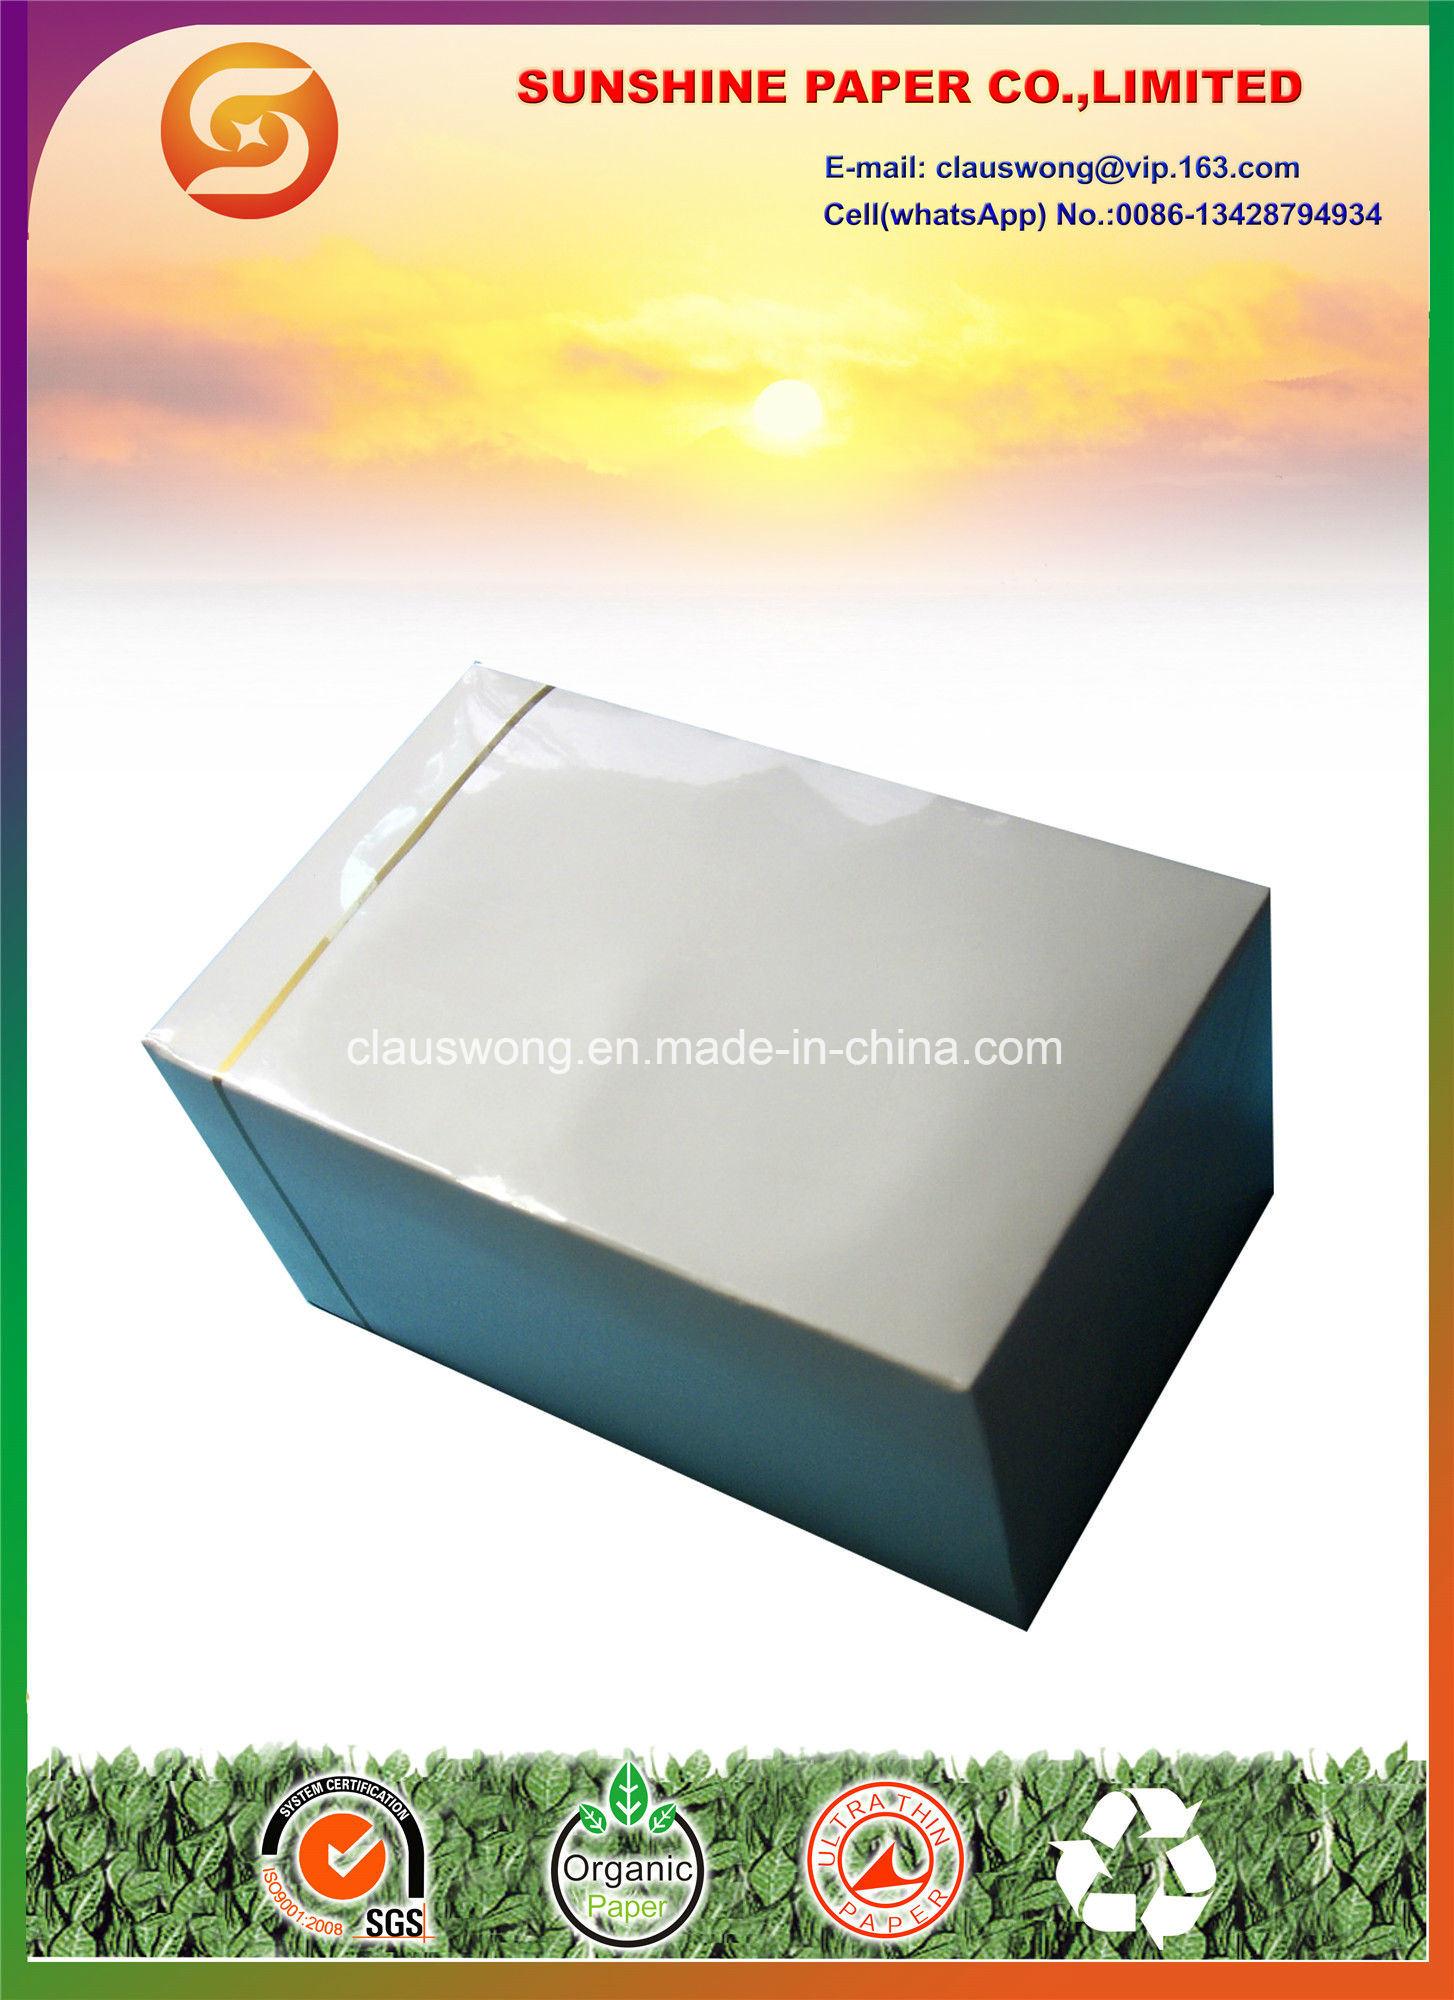 Customized Brand Queen Size Cigarette Paper